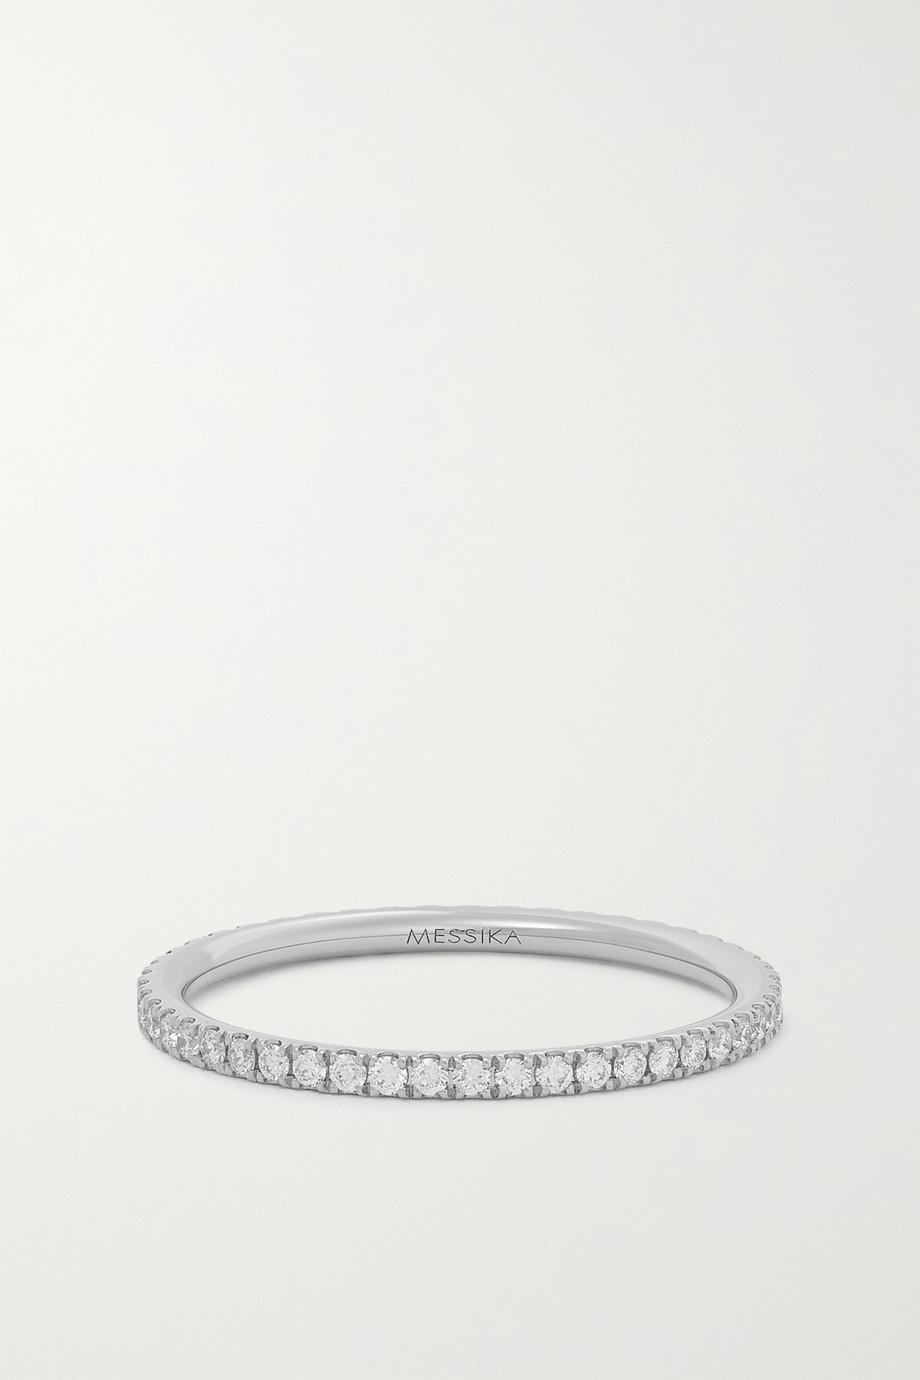 Messika Bague en or blanc 18 carats (750/1000) et diamants Gatsby